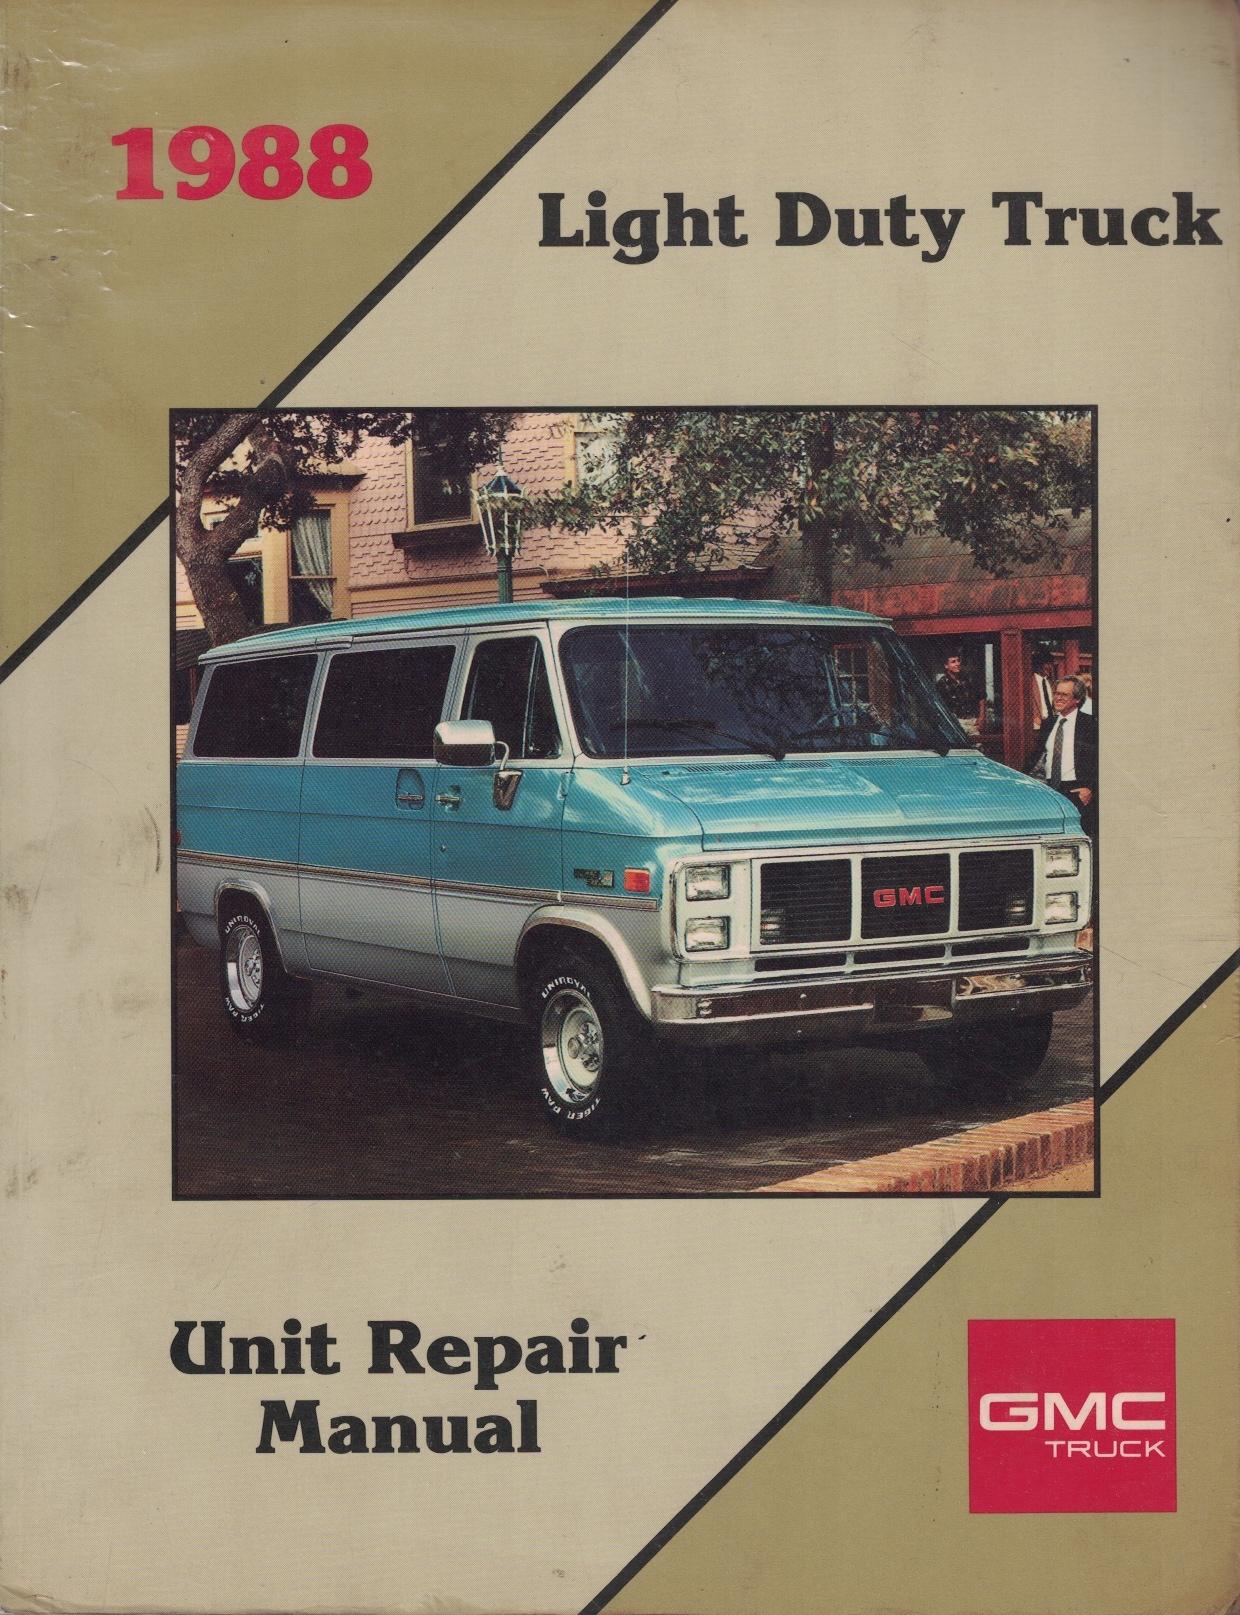 Image for 1988 GMC Light Duty Truck Unit Repair Manual [Original Service Manual]